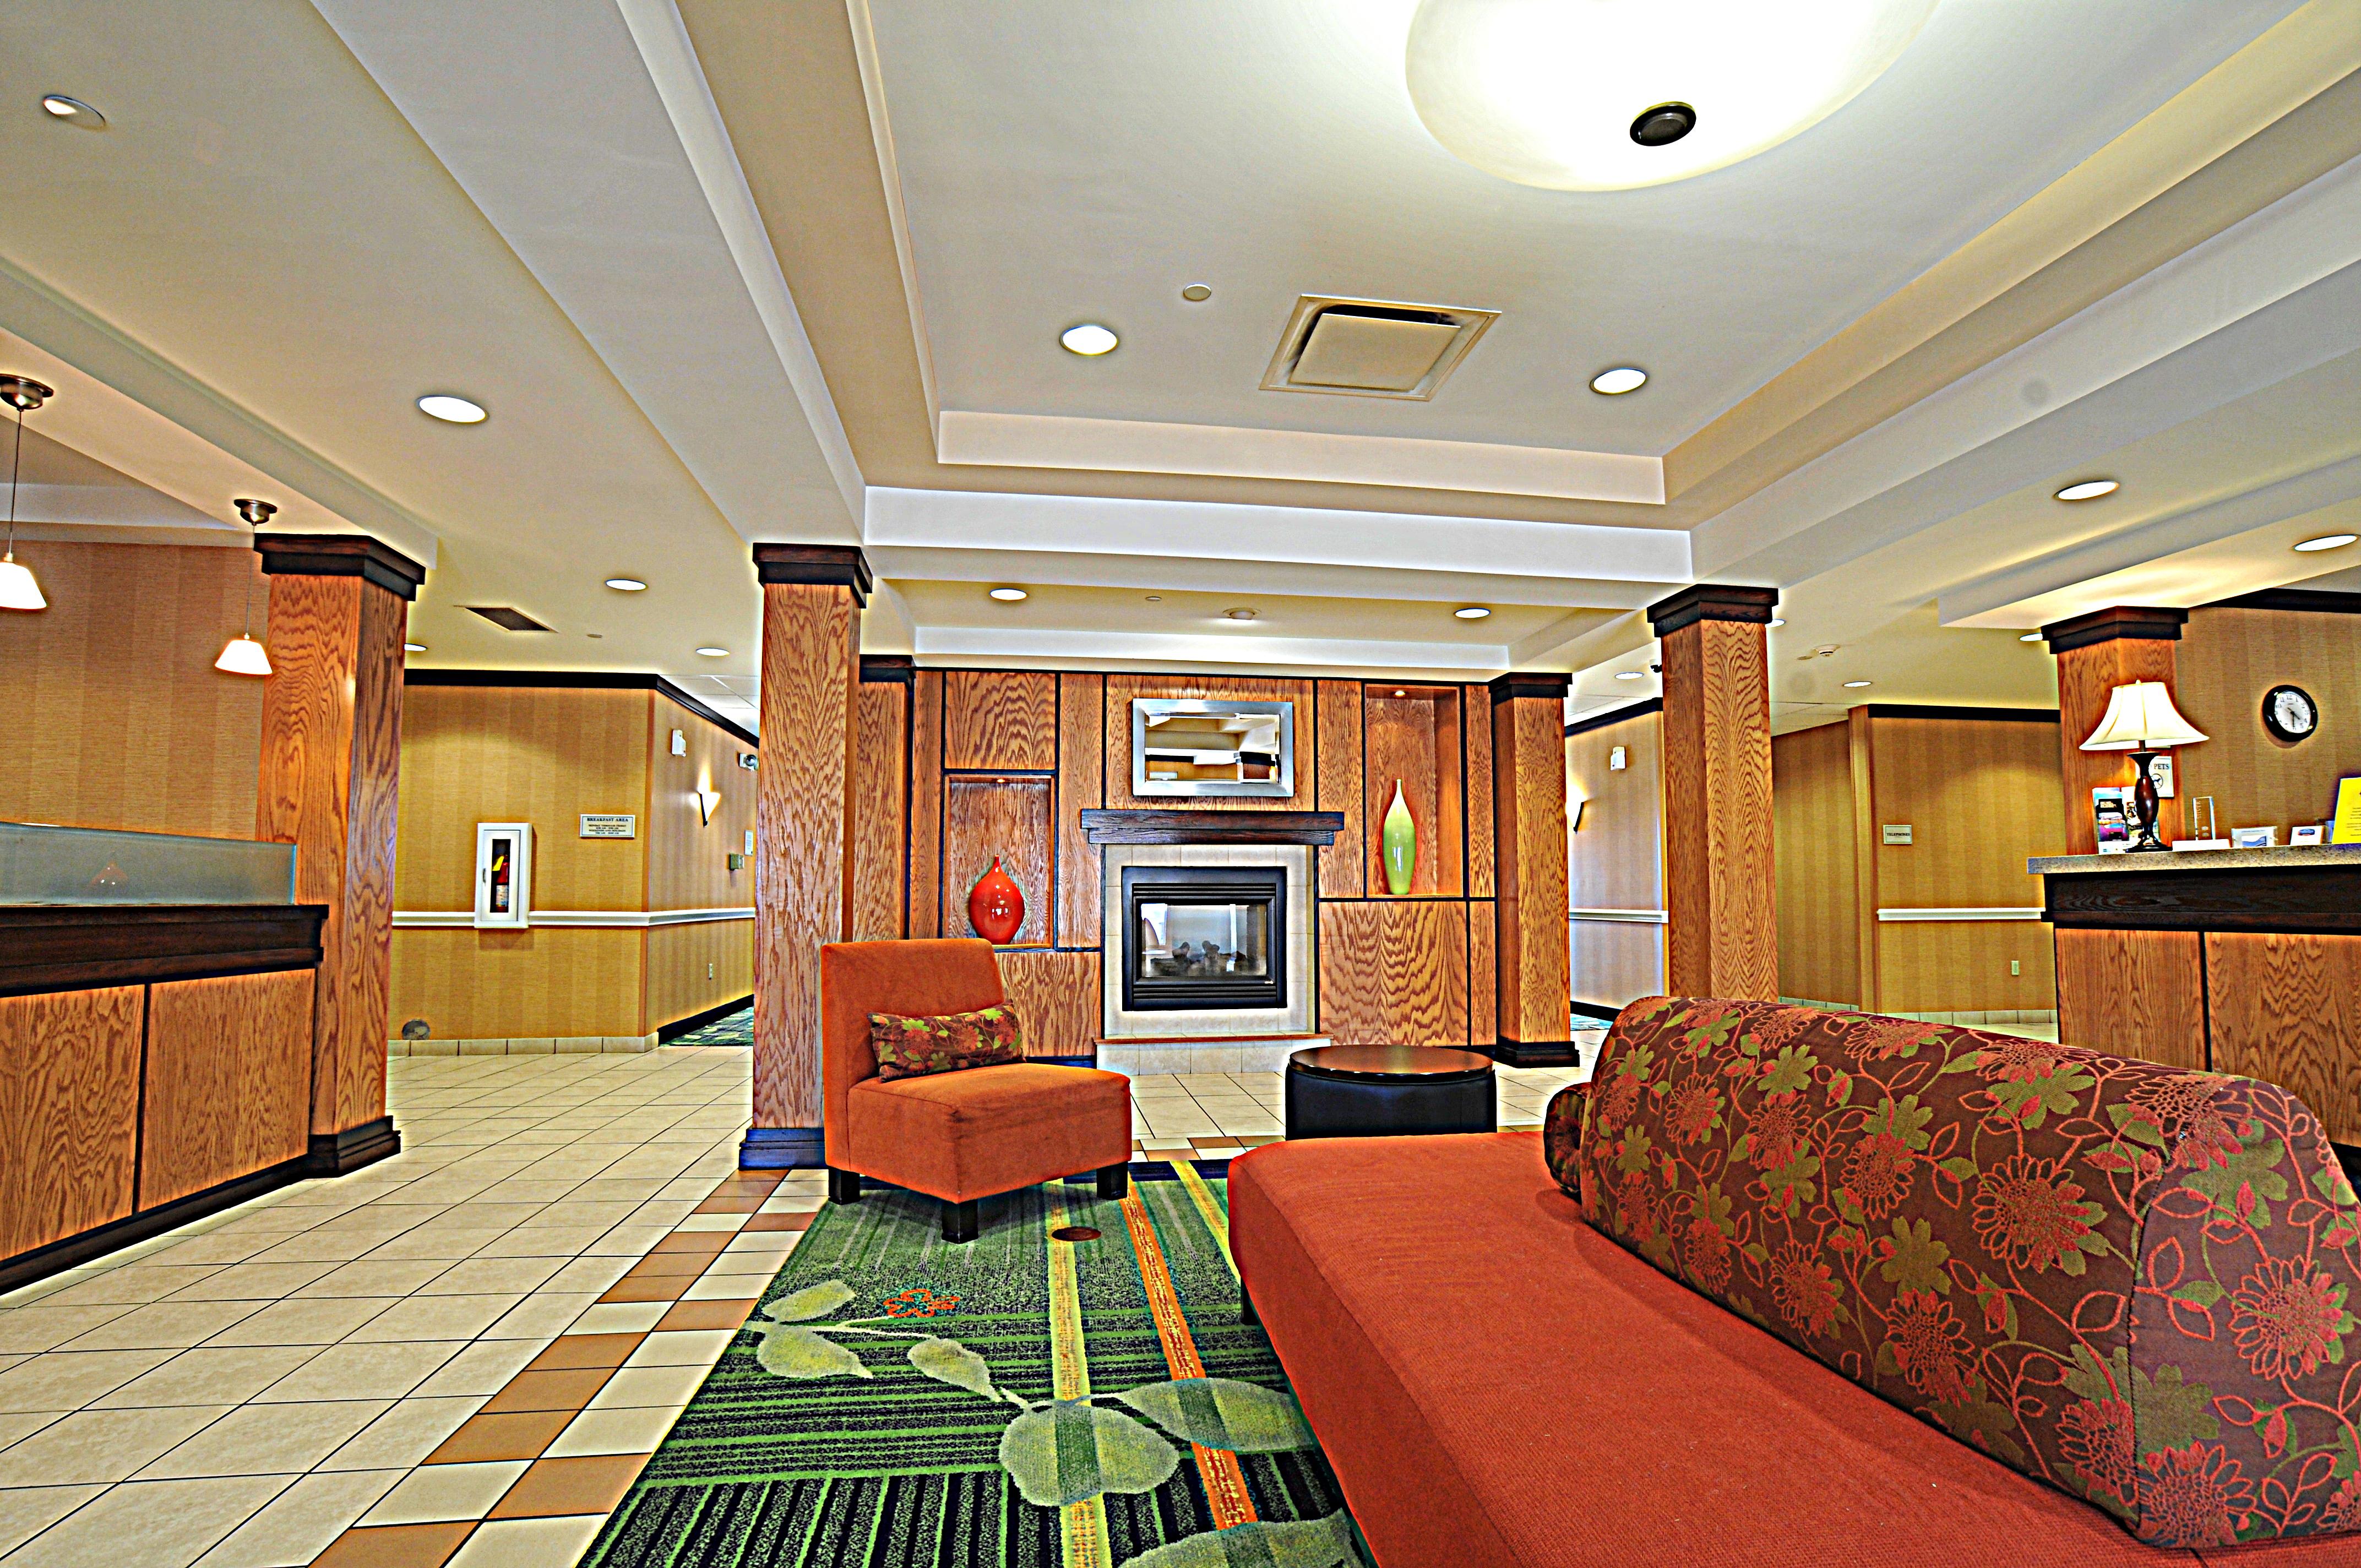 Fairfield Inn & Suites by Marriott Akron South image 46